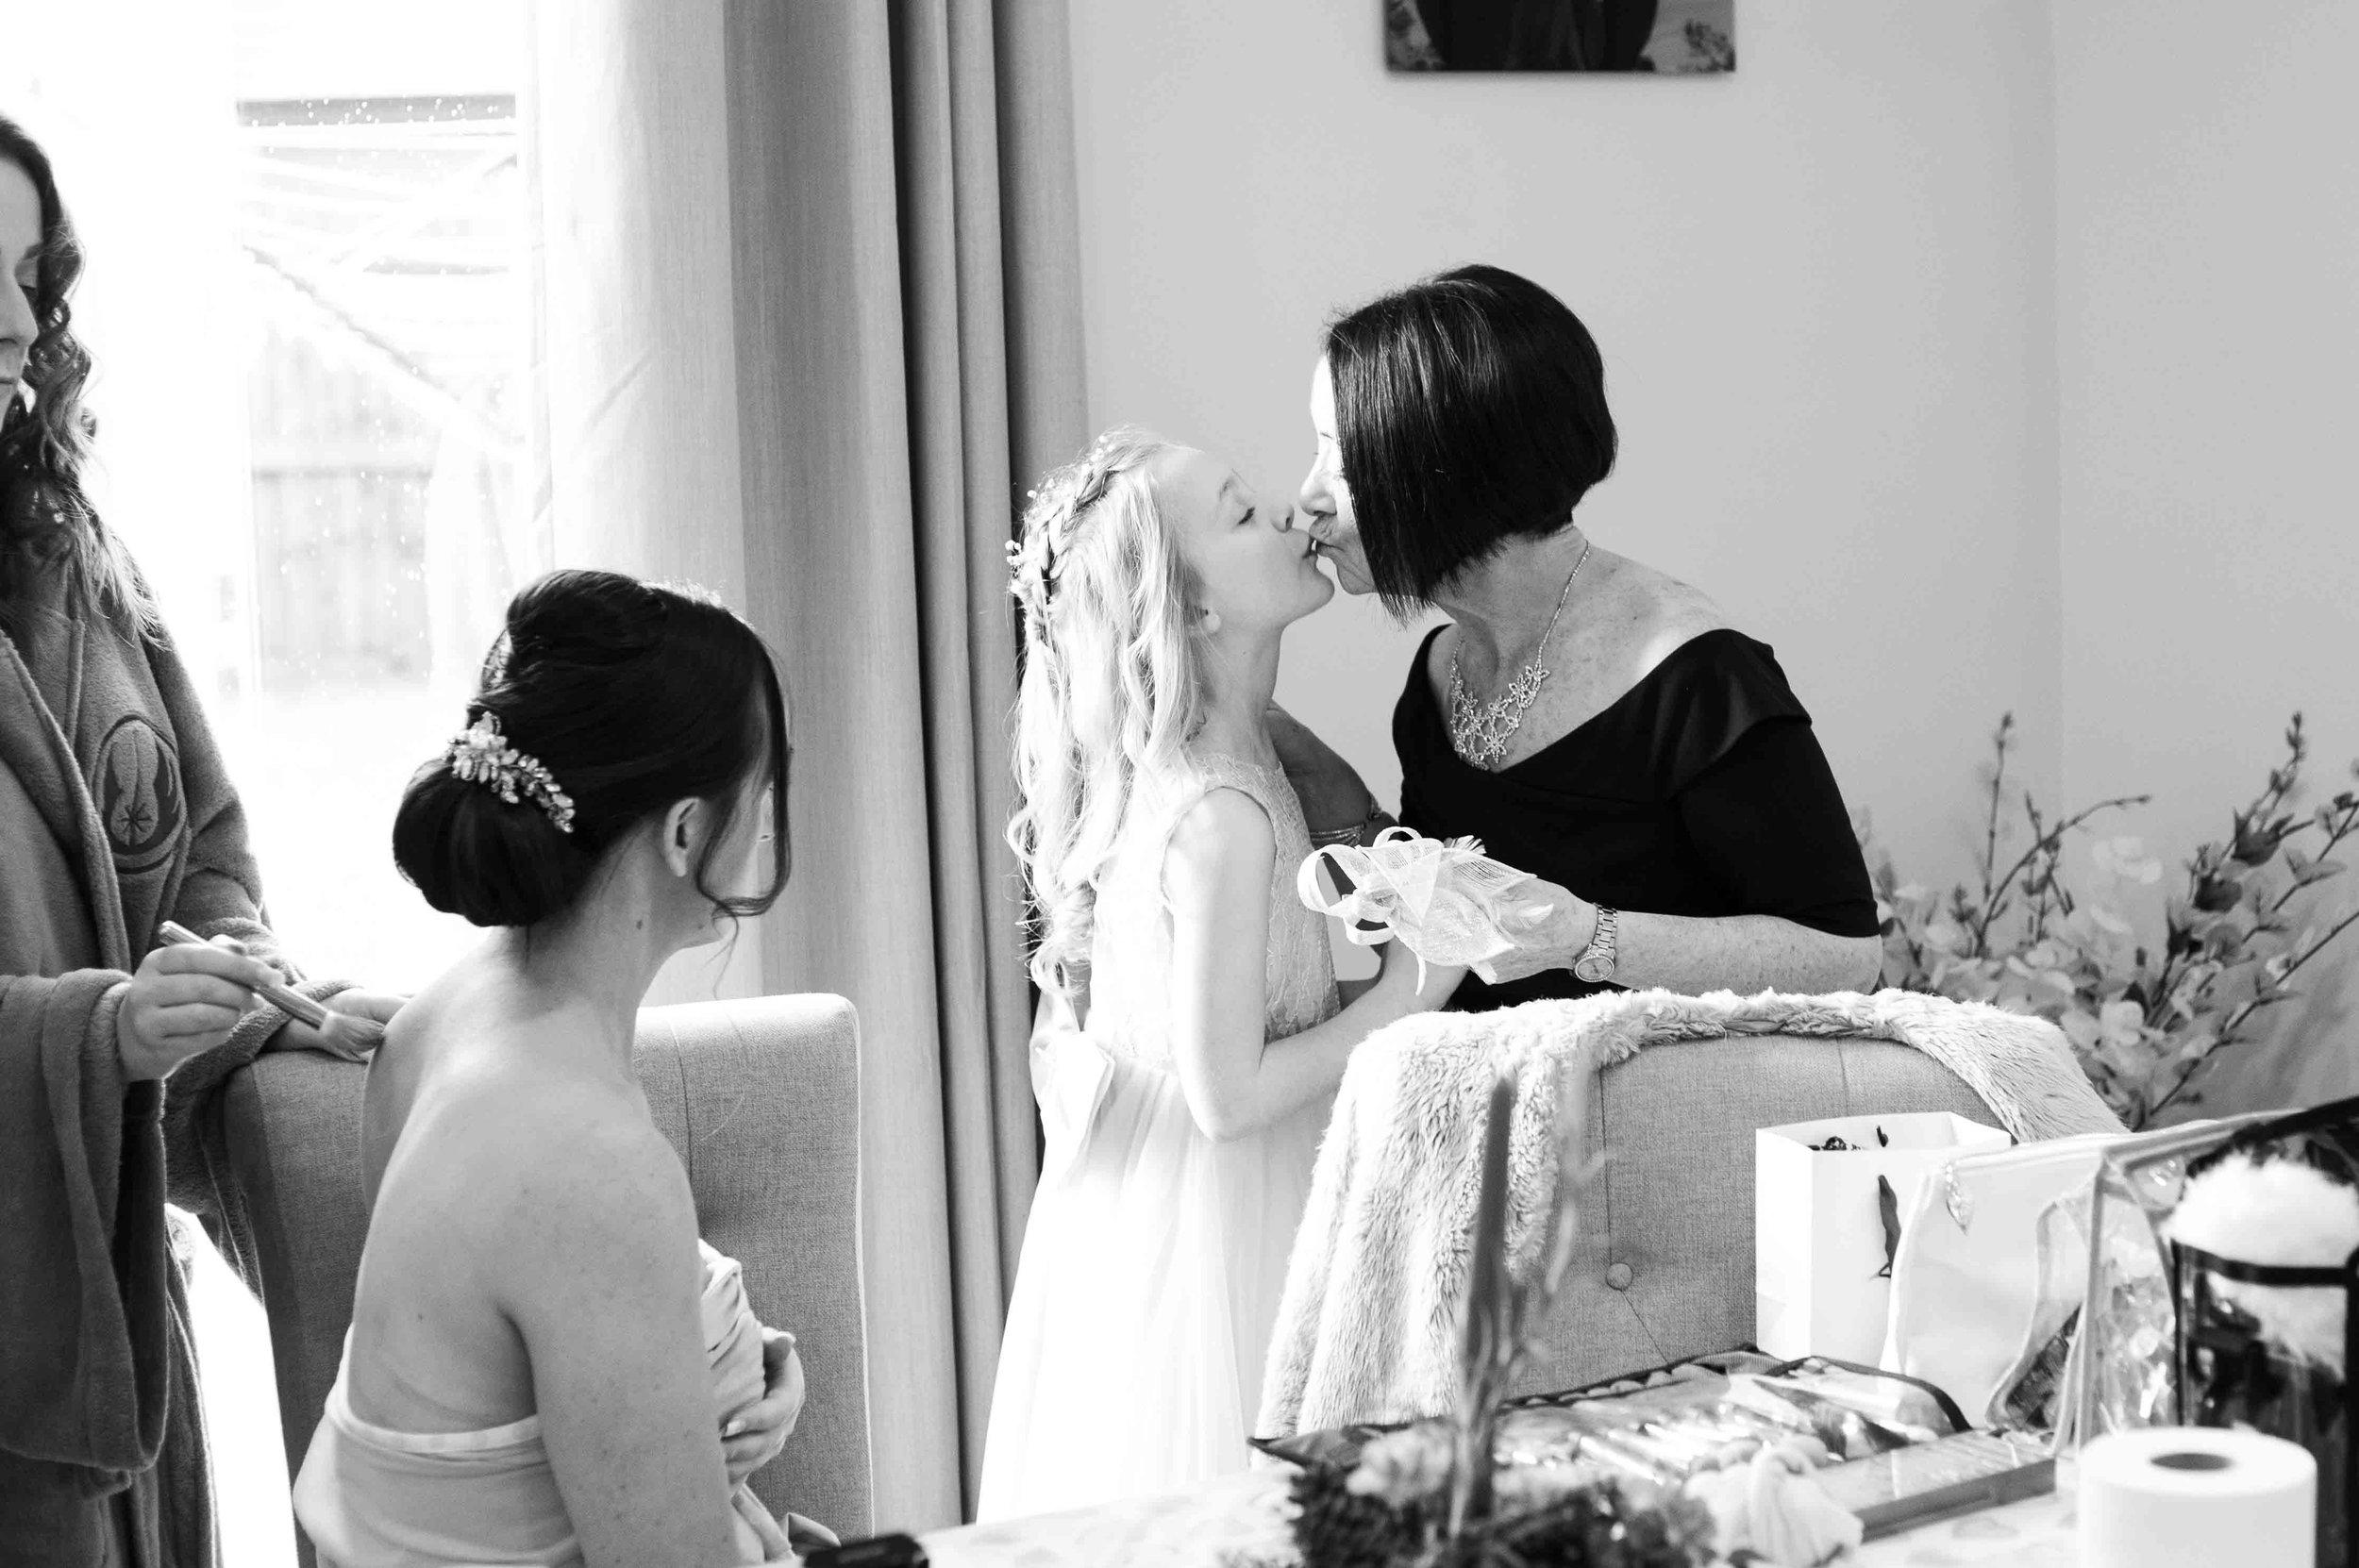 wedding-photos-willenhall-wedding-photographer-wolverhampton-wedding-photographer-west-midlands-wedding-photographer-birmingham-grandma-kiss.jpg